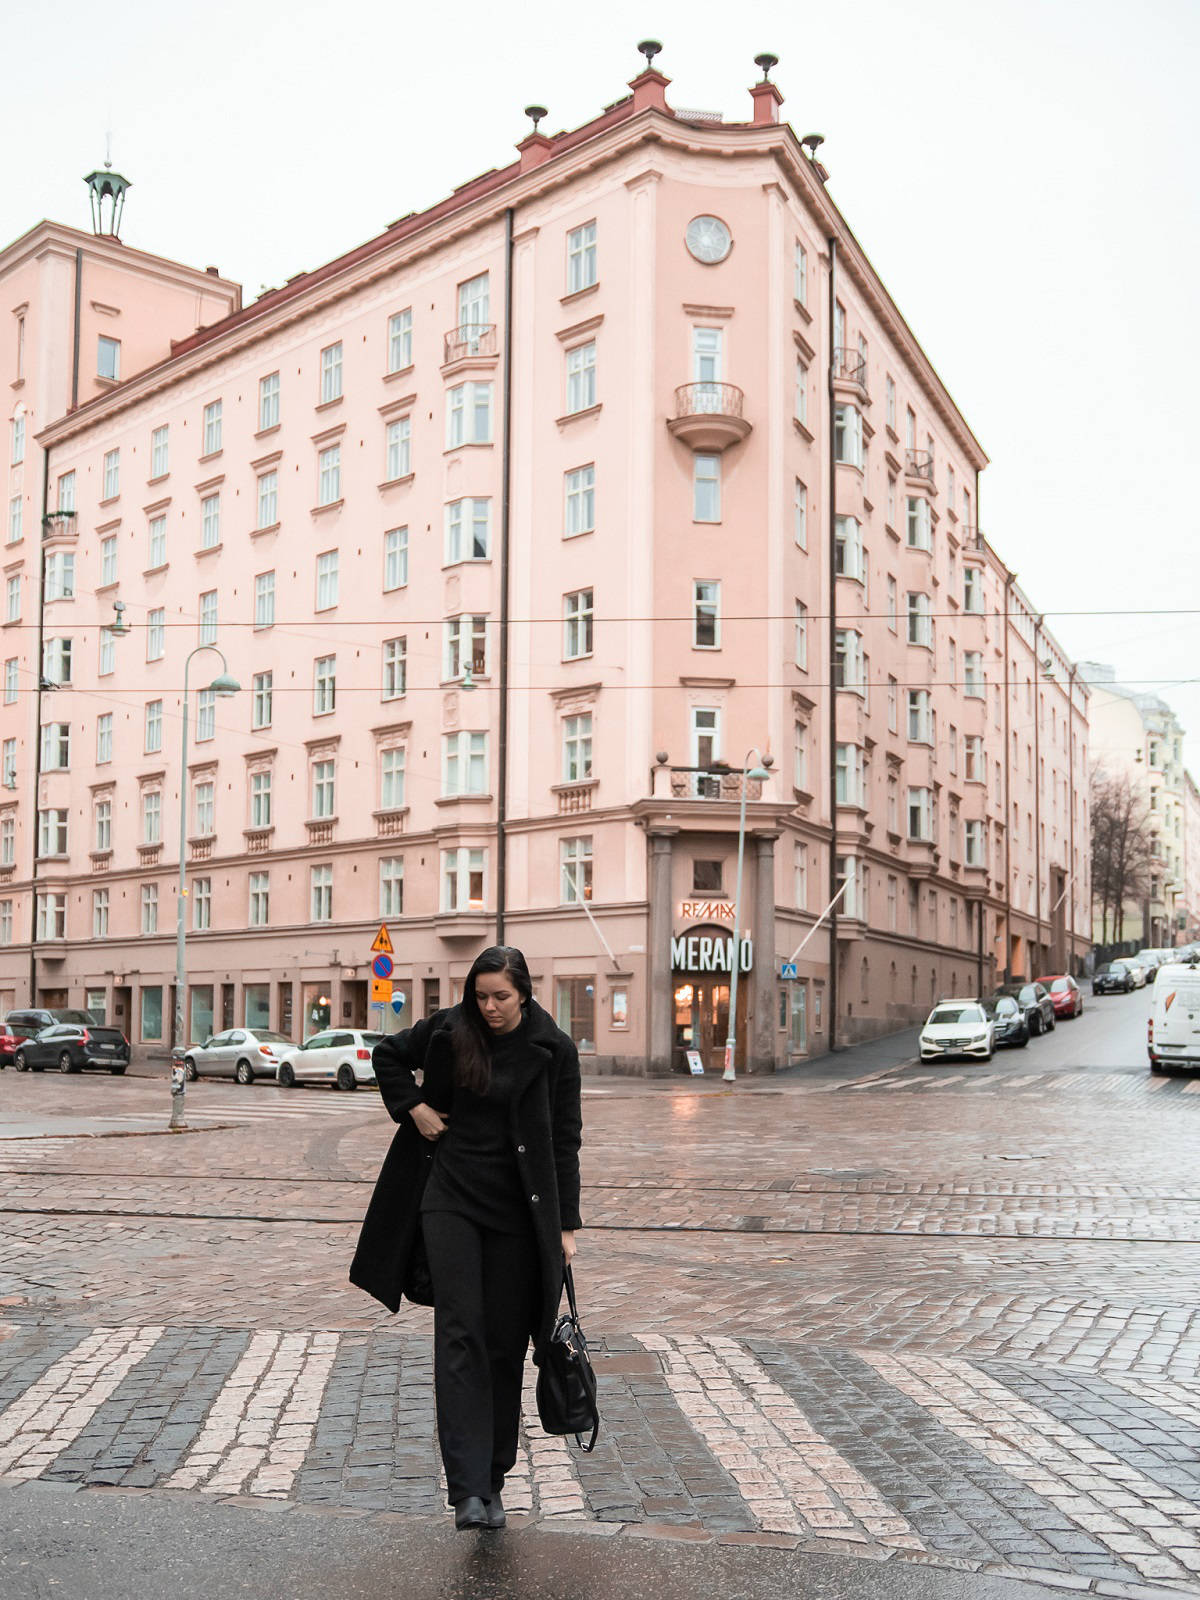 Asukuva_Helsinki_PauliinaM